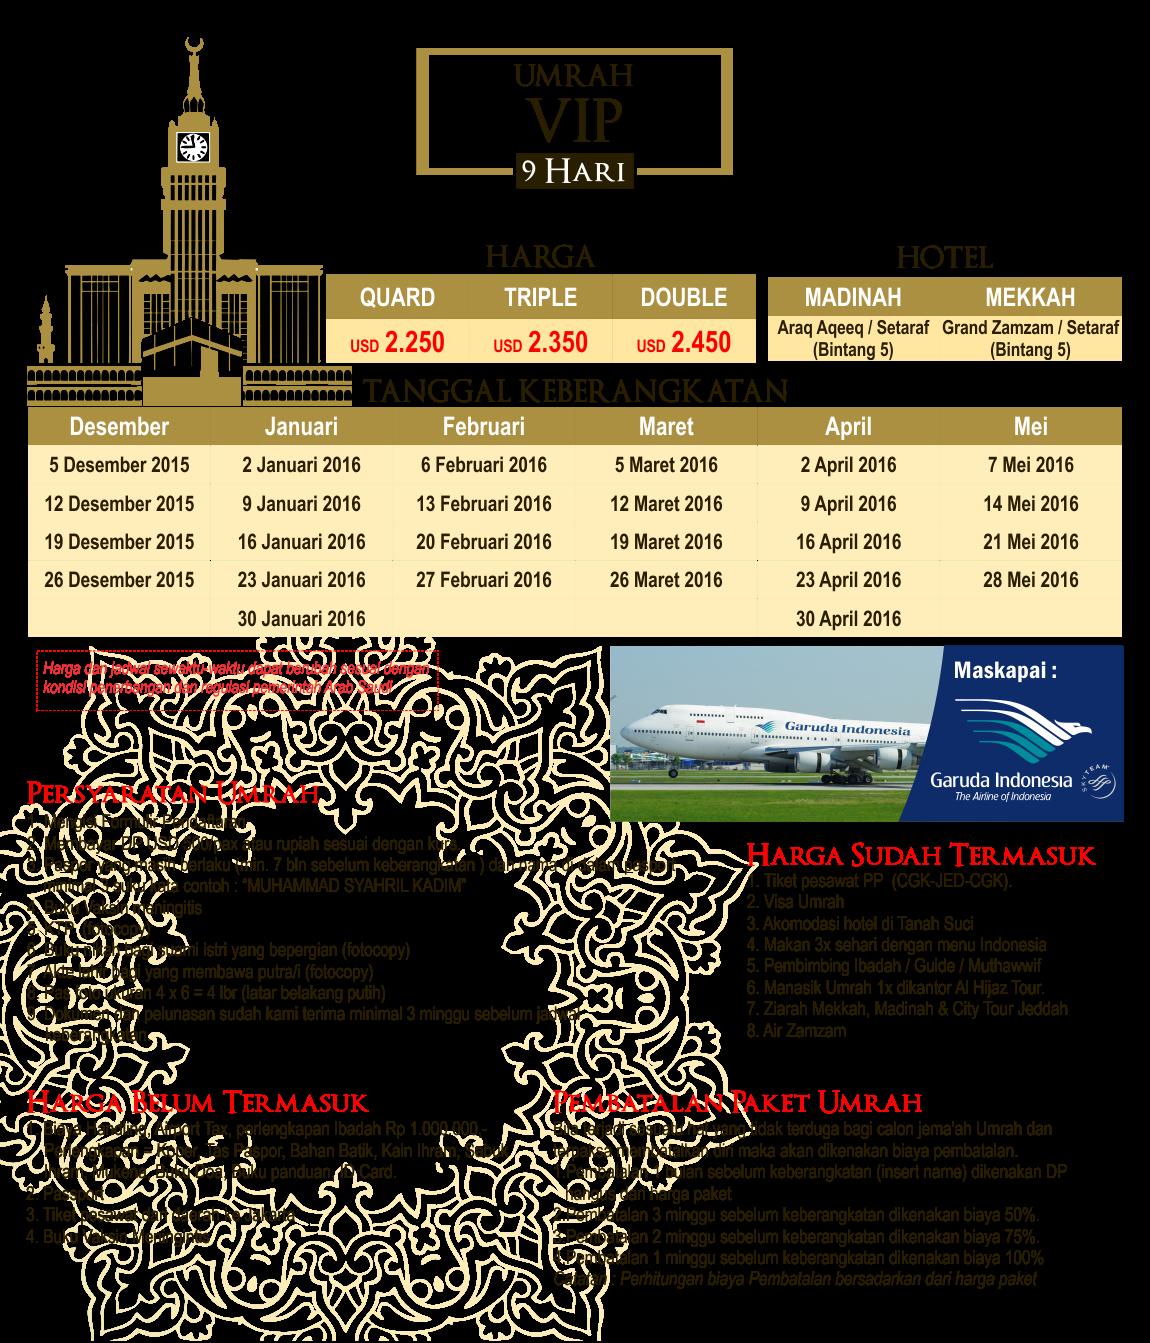 Harga Paket Umroh VIP 9 Hari Thaun 2016 Biro Travel Alhijaz